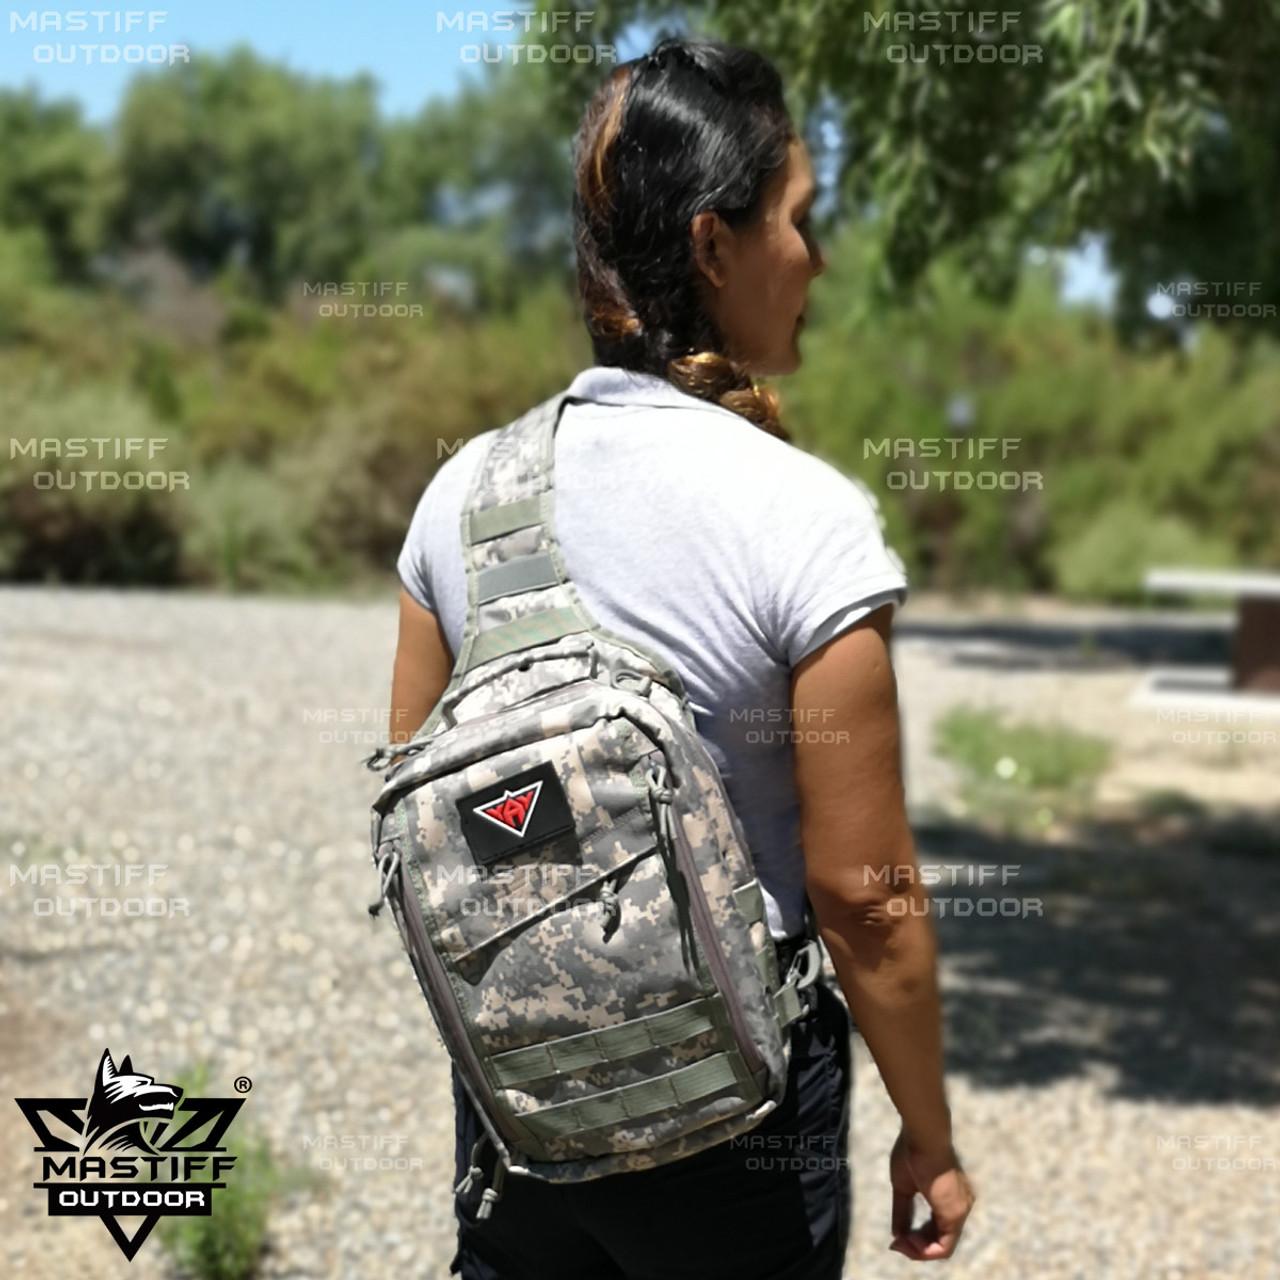 Nylon Outdoor Gear Rover Sling Pack Cross Body Backpack